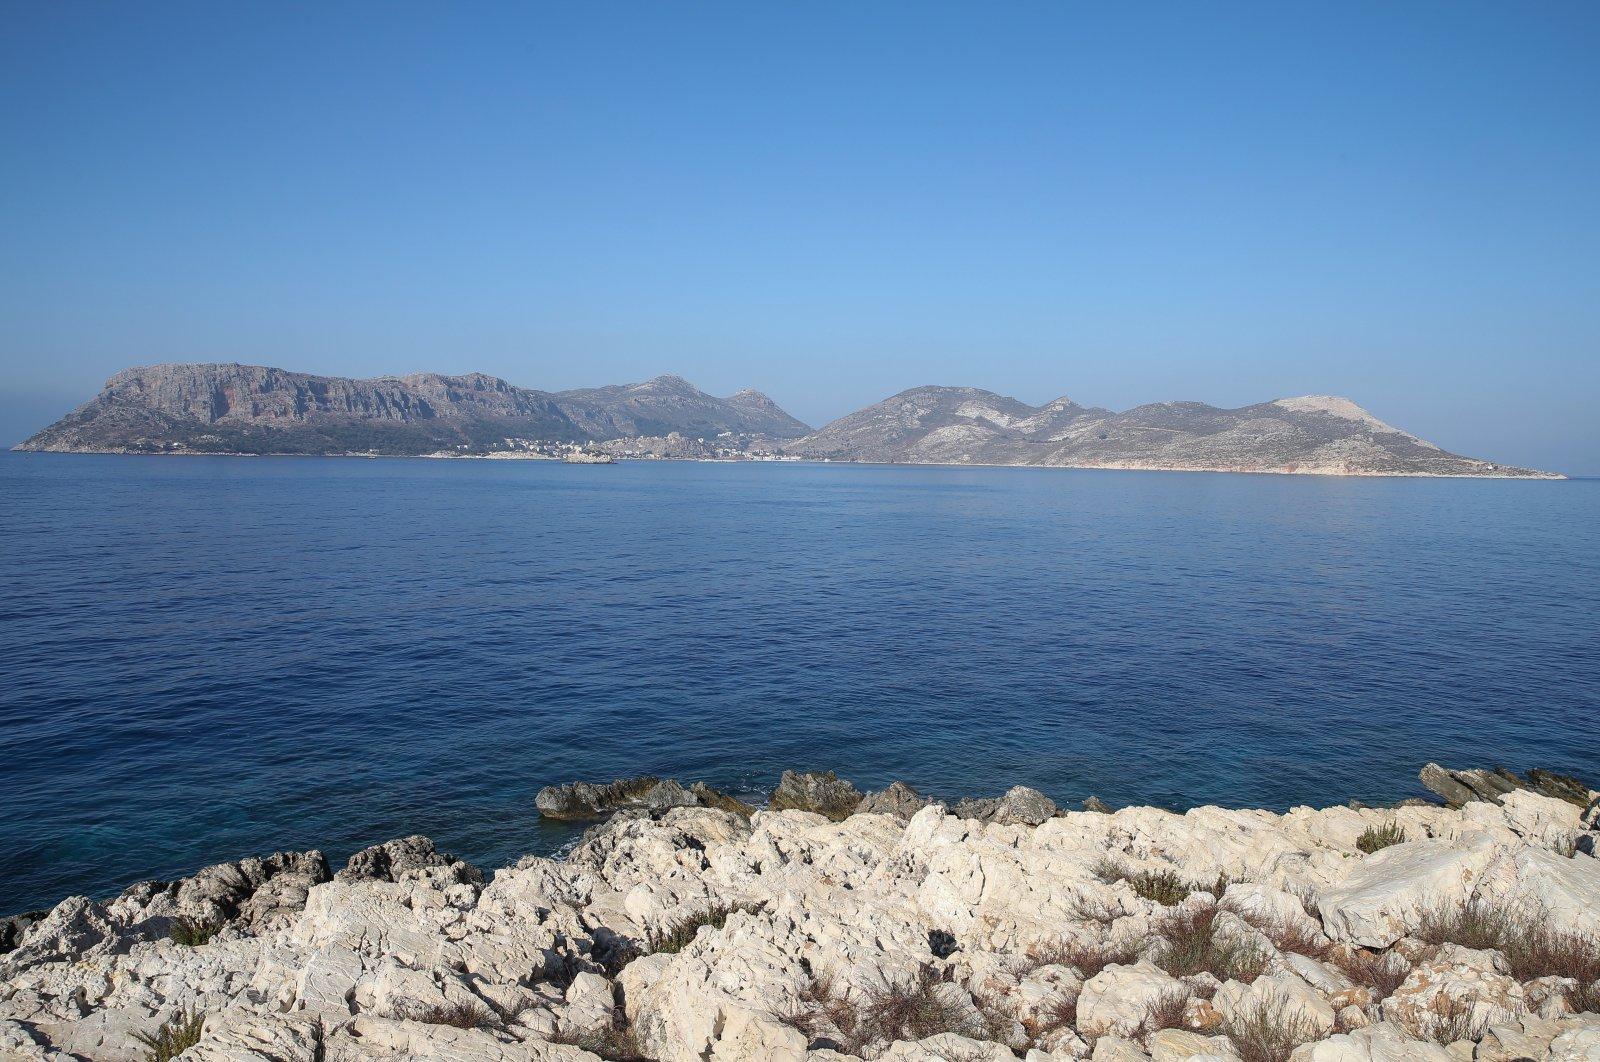 The Greek island of Kastellorizo (Megisti-Meis) photographed from the Kaş, Antalya, southern Turkey, Sept. 1, 2020 (AA Photo)